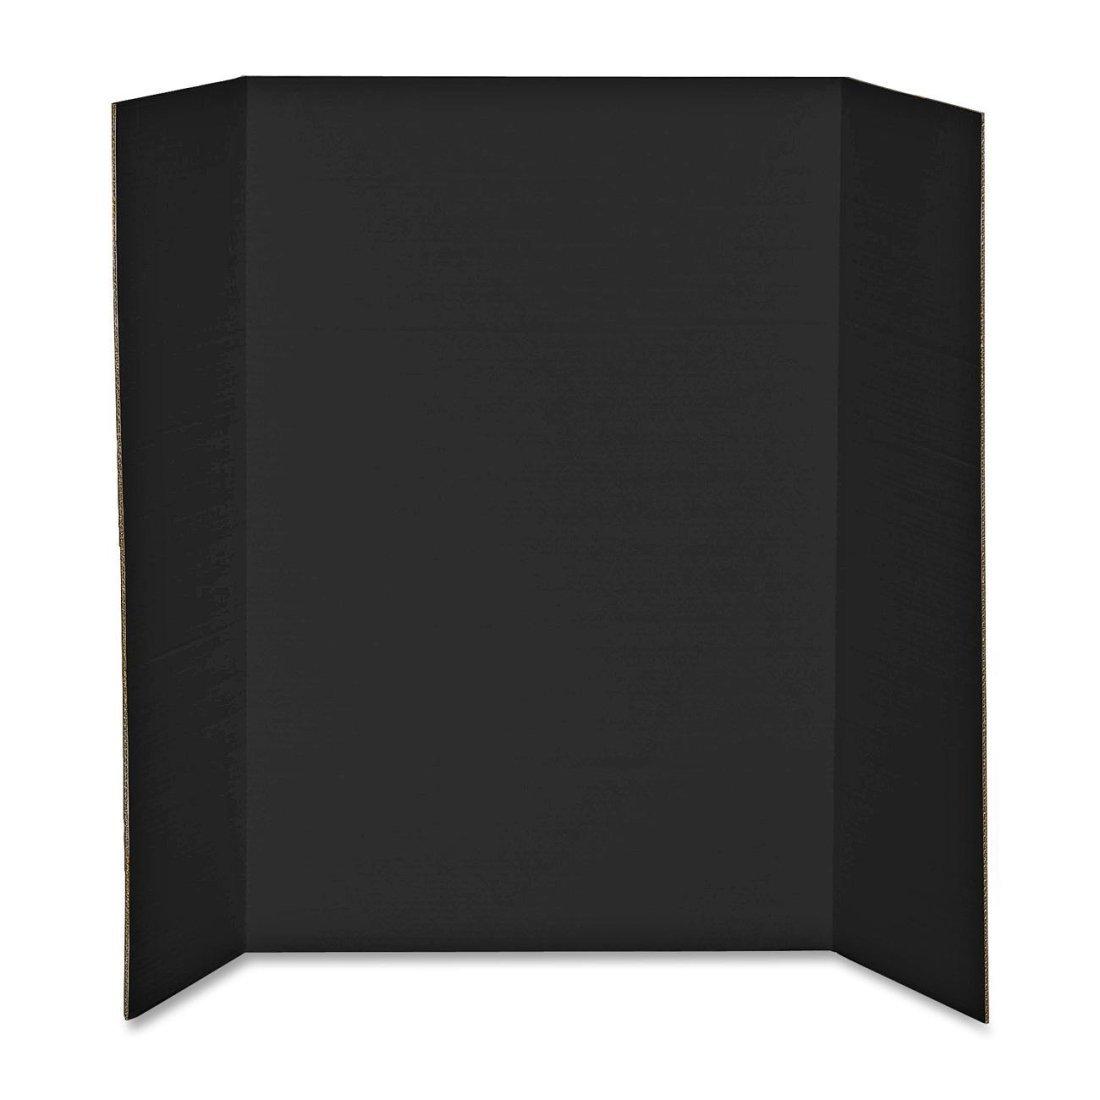 Elmer's Heavy-Duty Tri-Fold Display Boards, 36 x 48 Inches, Black, 12-Count (730191)